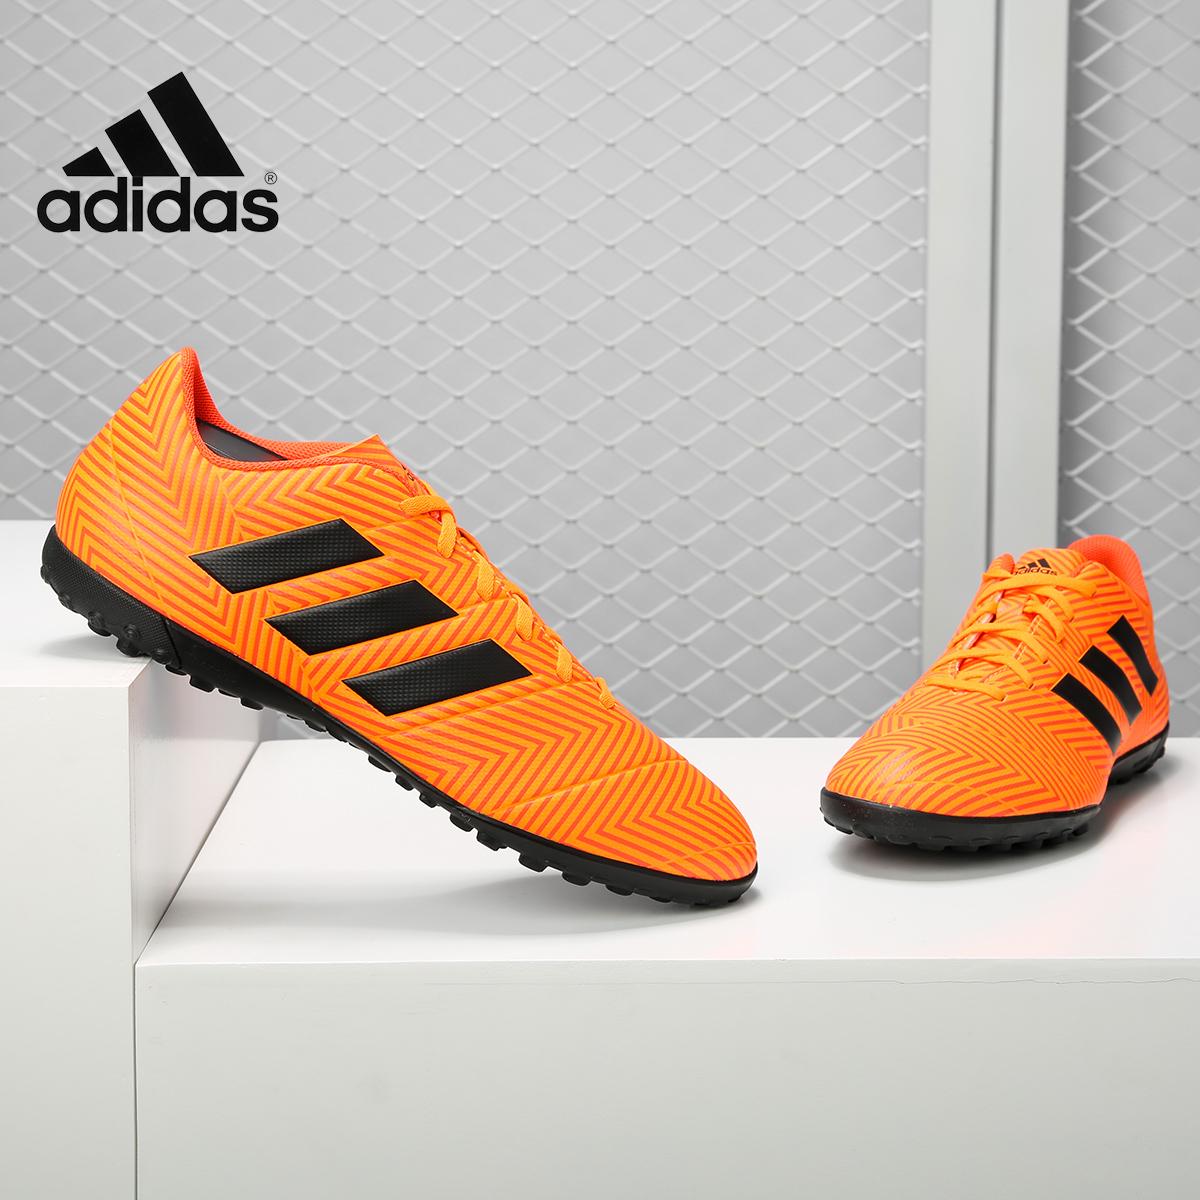 Adidas/阿迪达斯正品2019新款NEMEZIZ运动鞋TF碎钉足球鞋DA9624